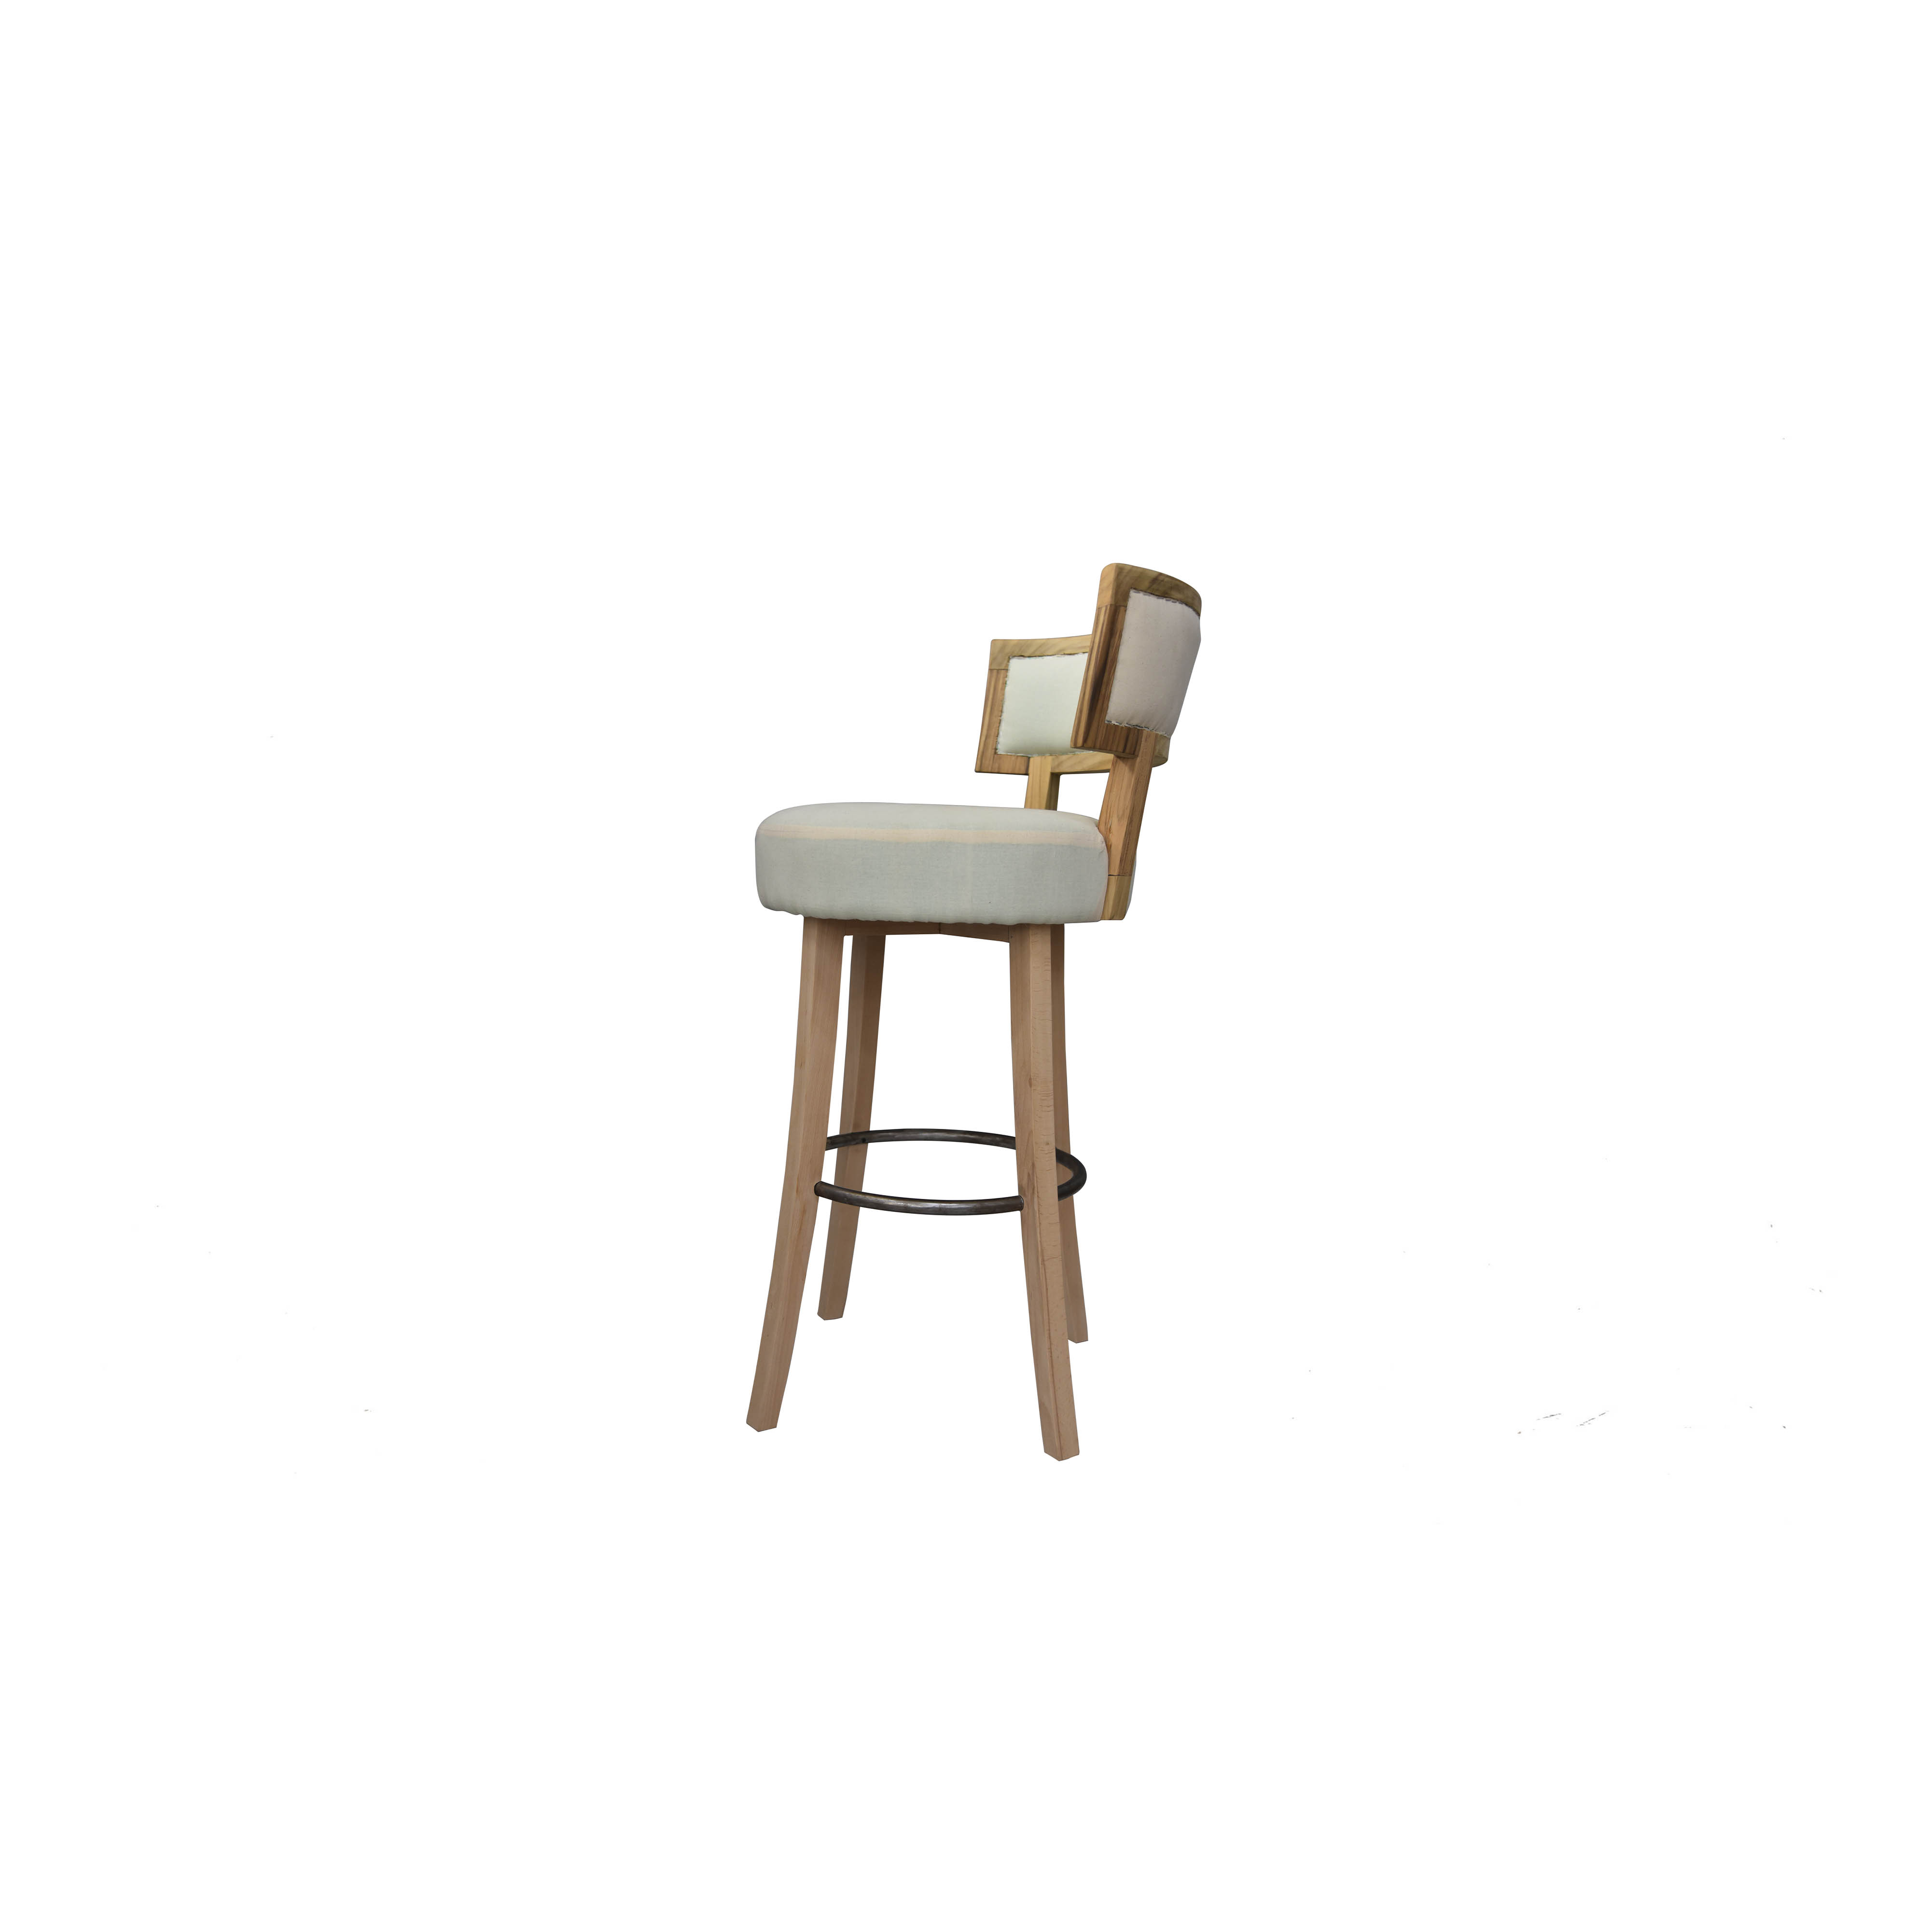 Fitzroy bar chair